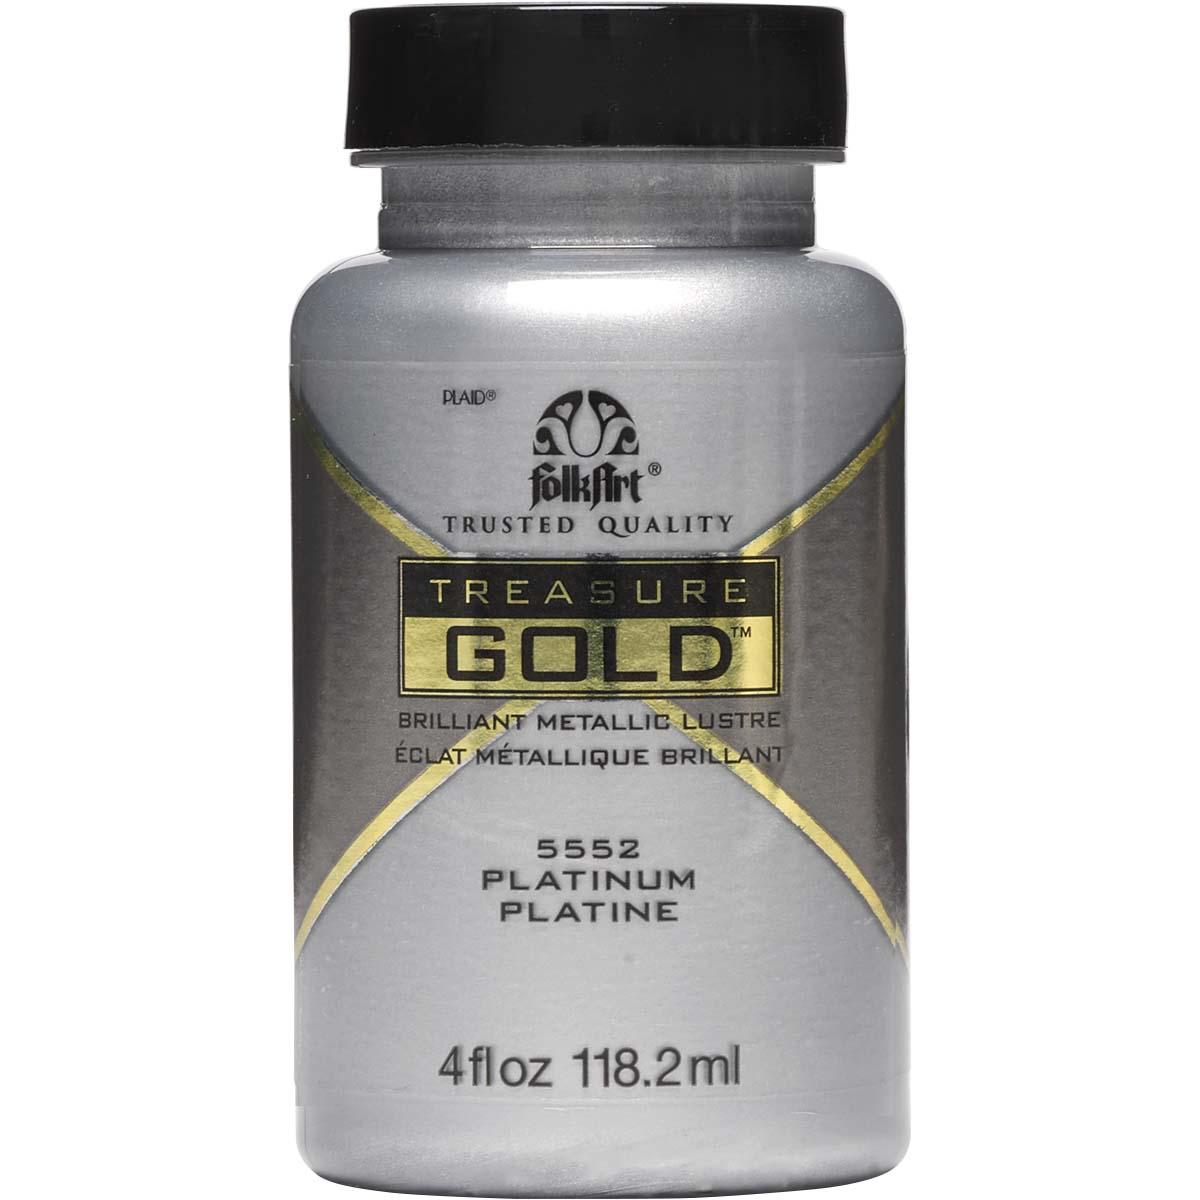 FolkArt ® Treasure Gold™ - Platinum, 4 oz. - 5552